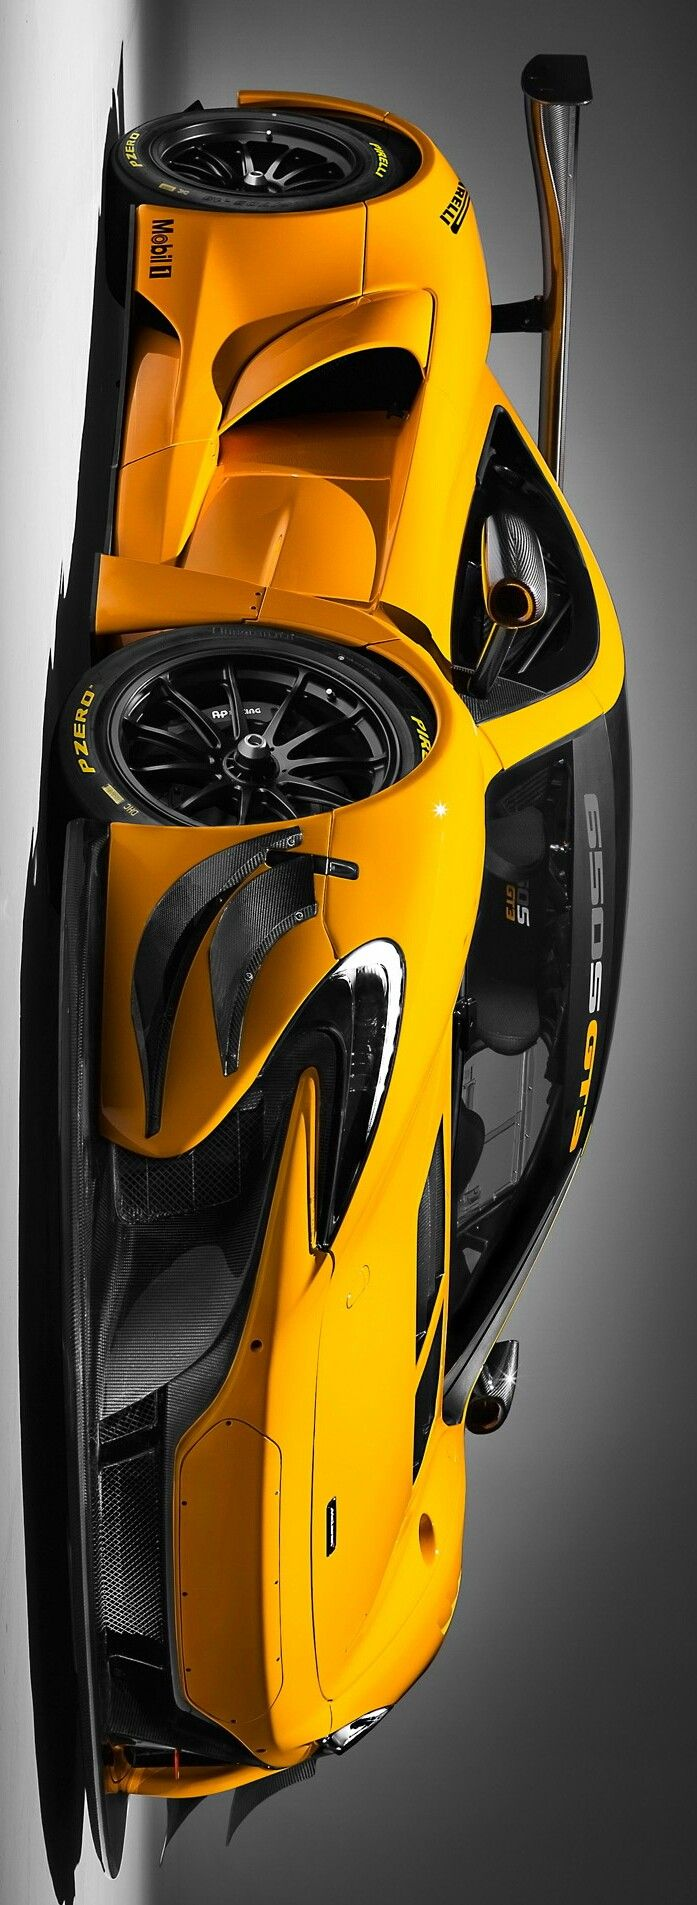 The 25 best mclaren car price ideas on pinterest mclaren price mclaren p1 price and p1 price